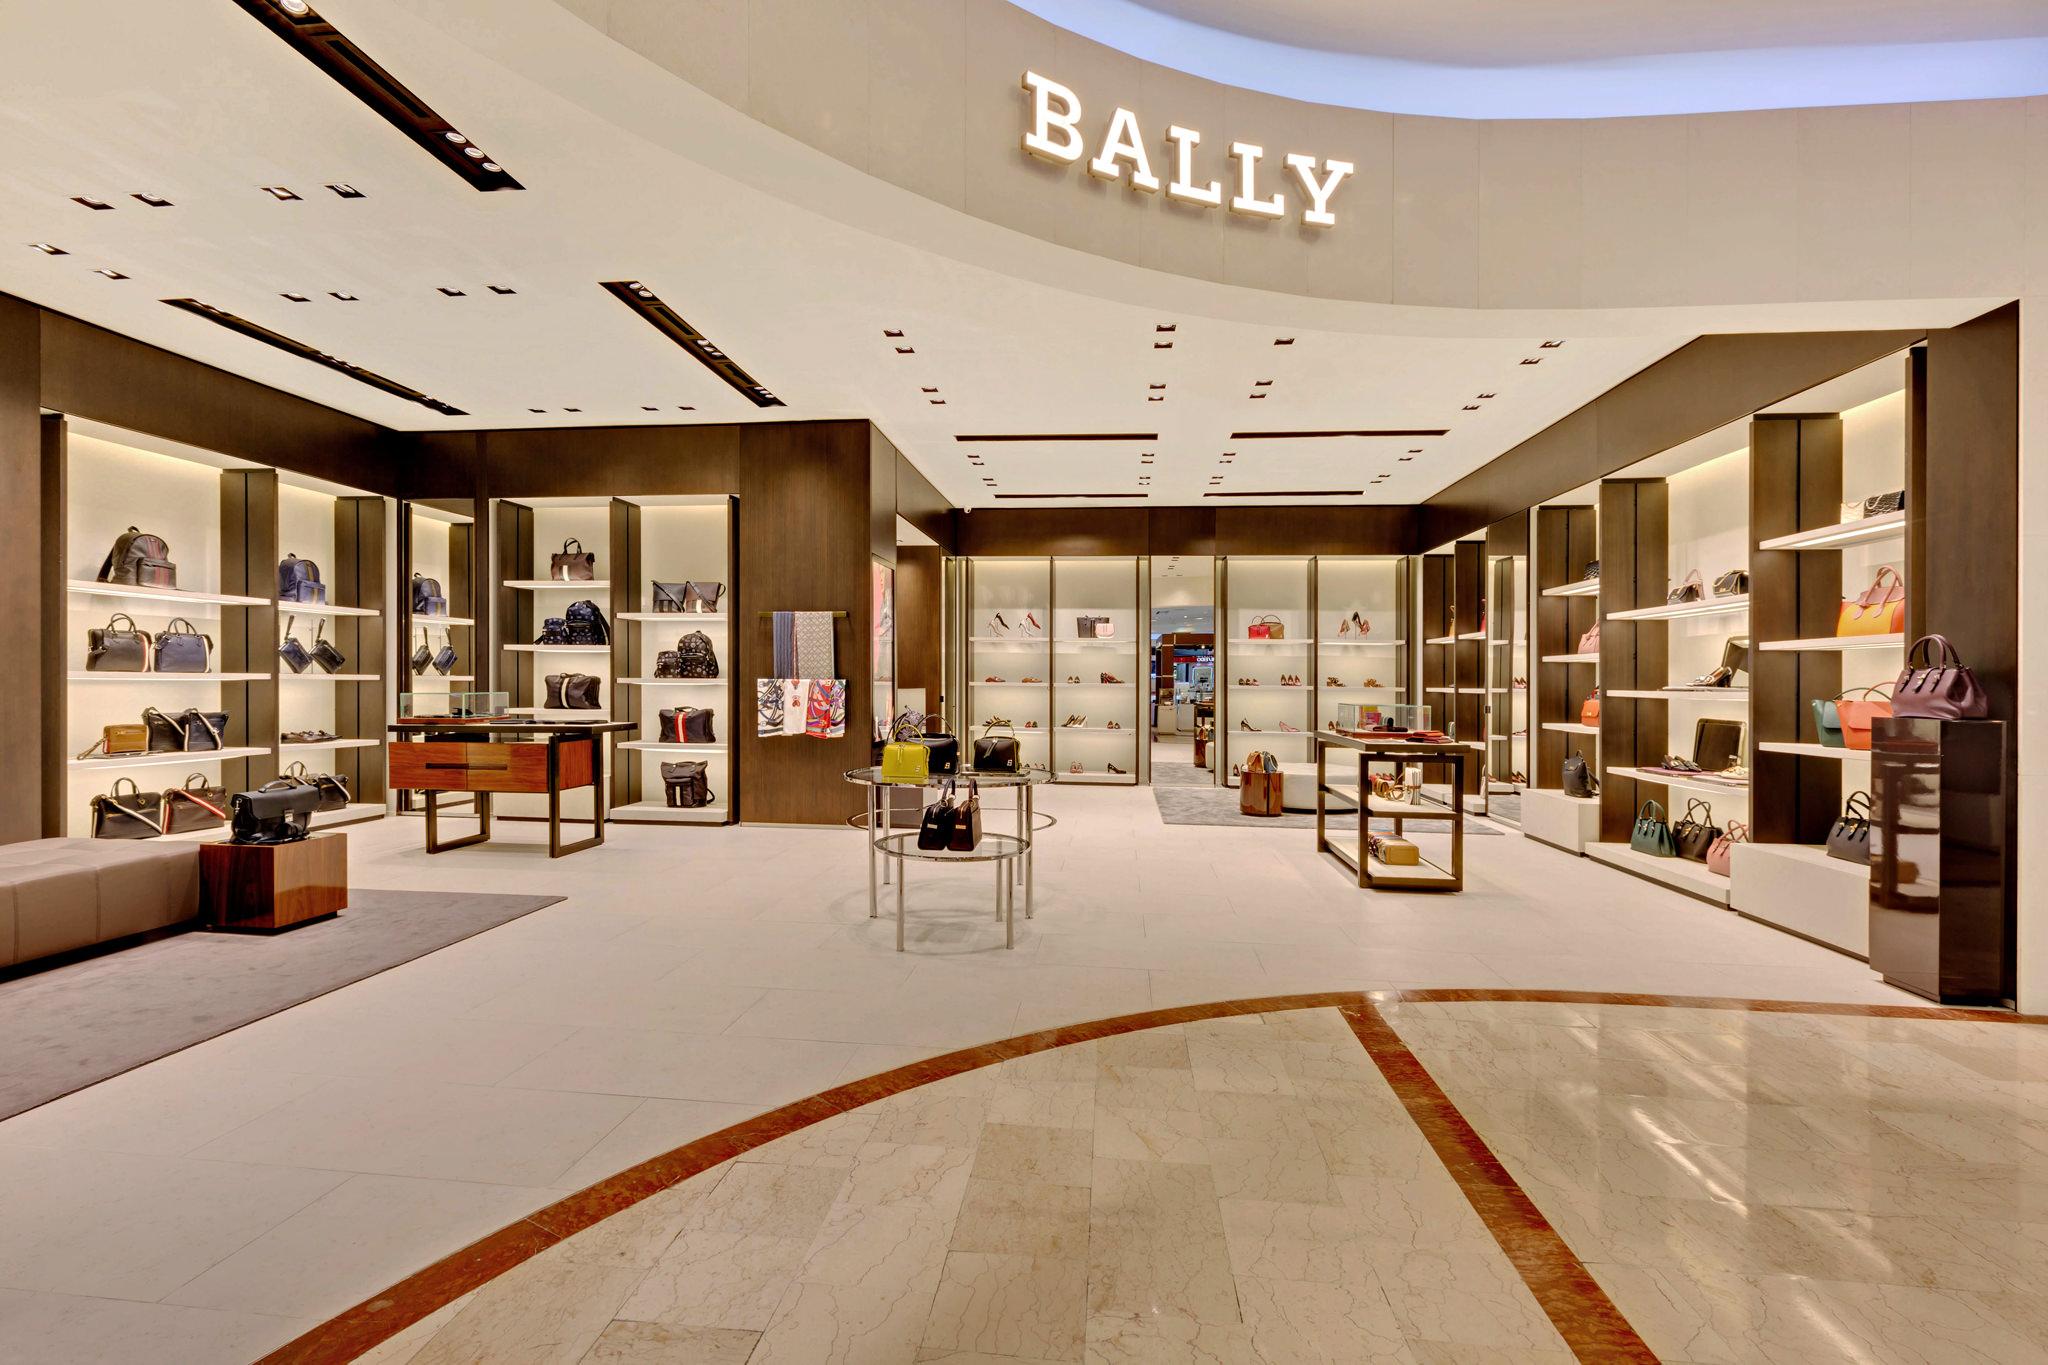 20170721 - Bally - HCM - Commercial - Interior - Store - Retouch 0013.jpg